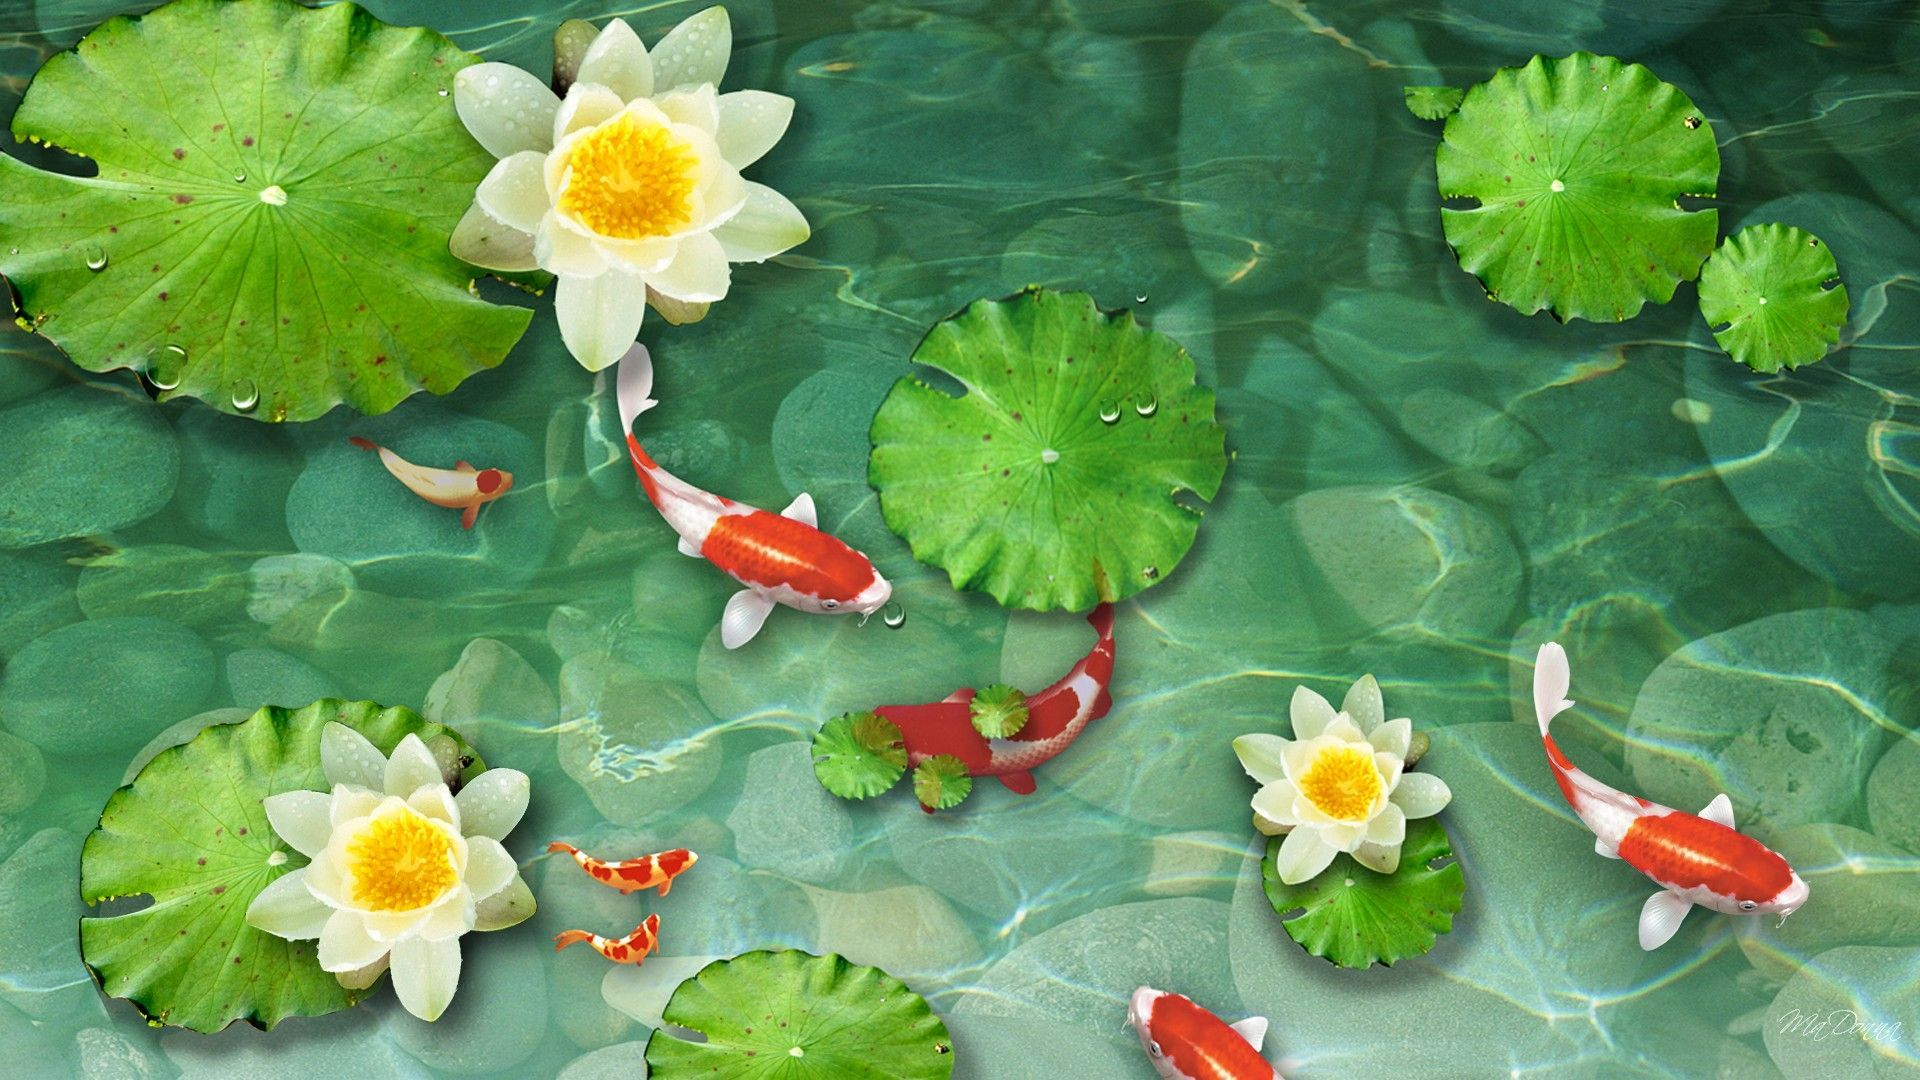 Green koi fish wallpapers top free green koi fish for Koi pond screensaver